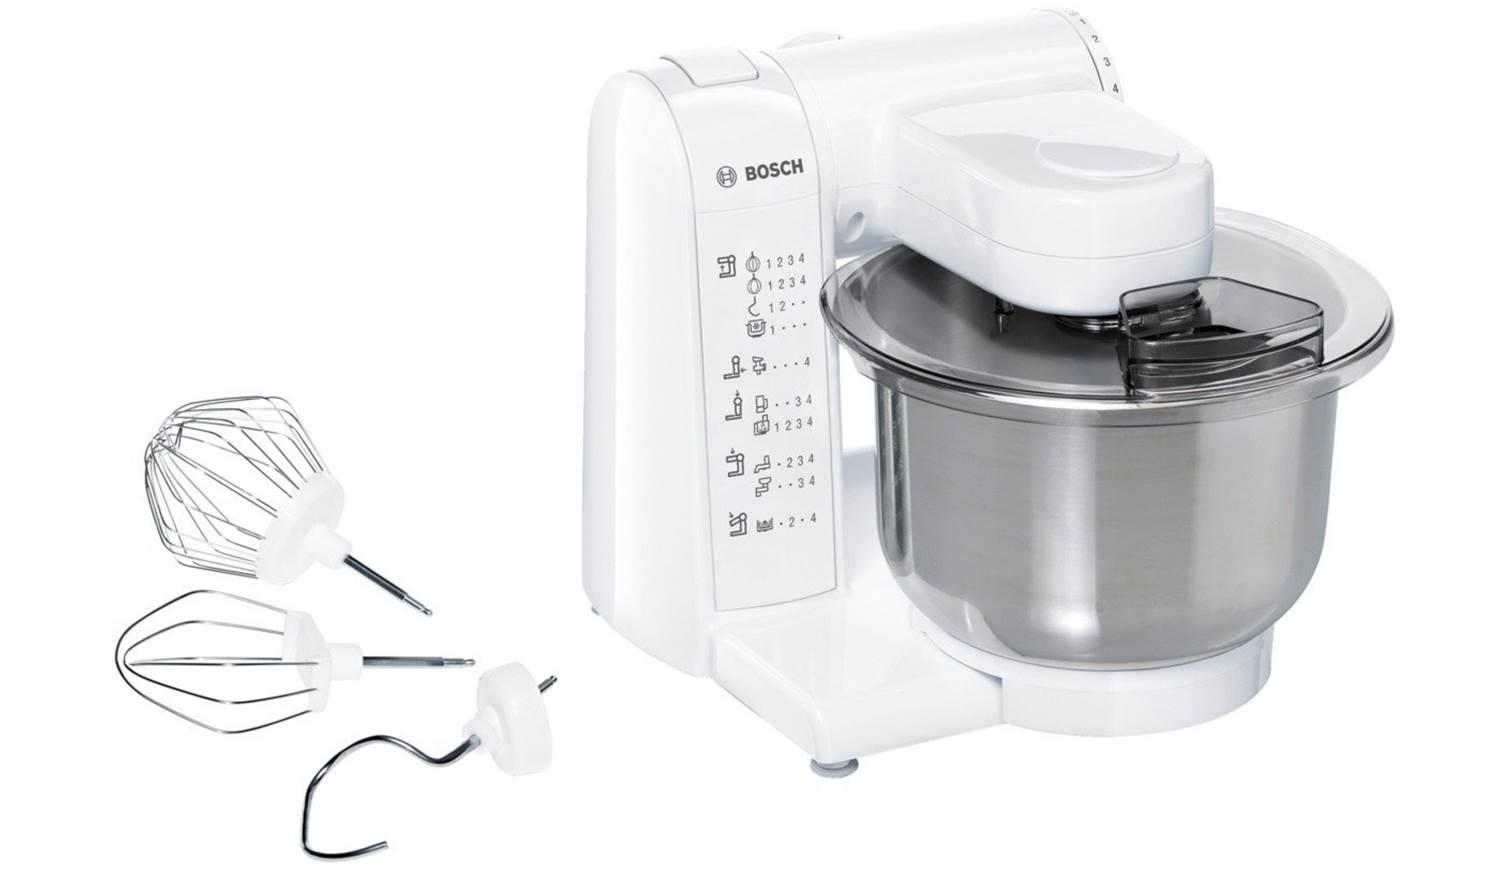 Bosch Mum4807gb Kitchen Machine Harvey Norman Singapore